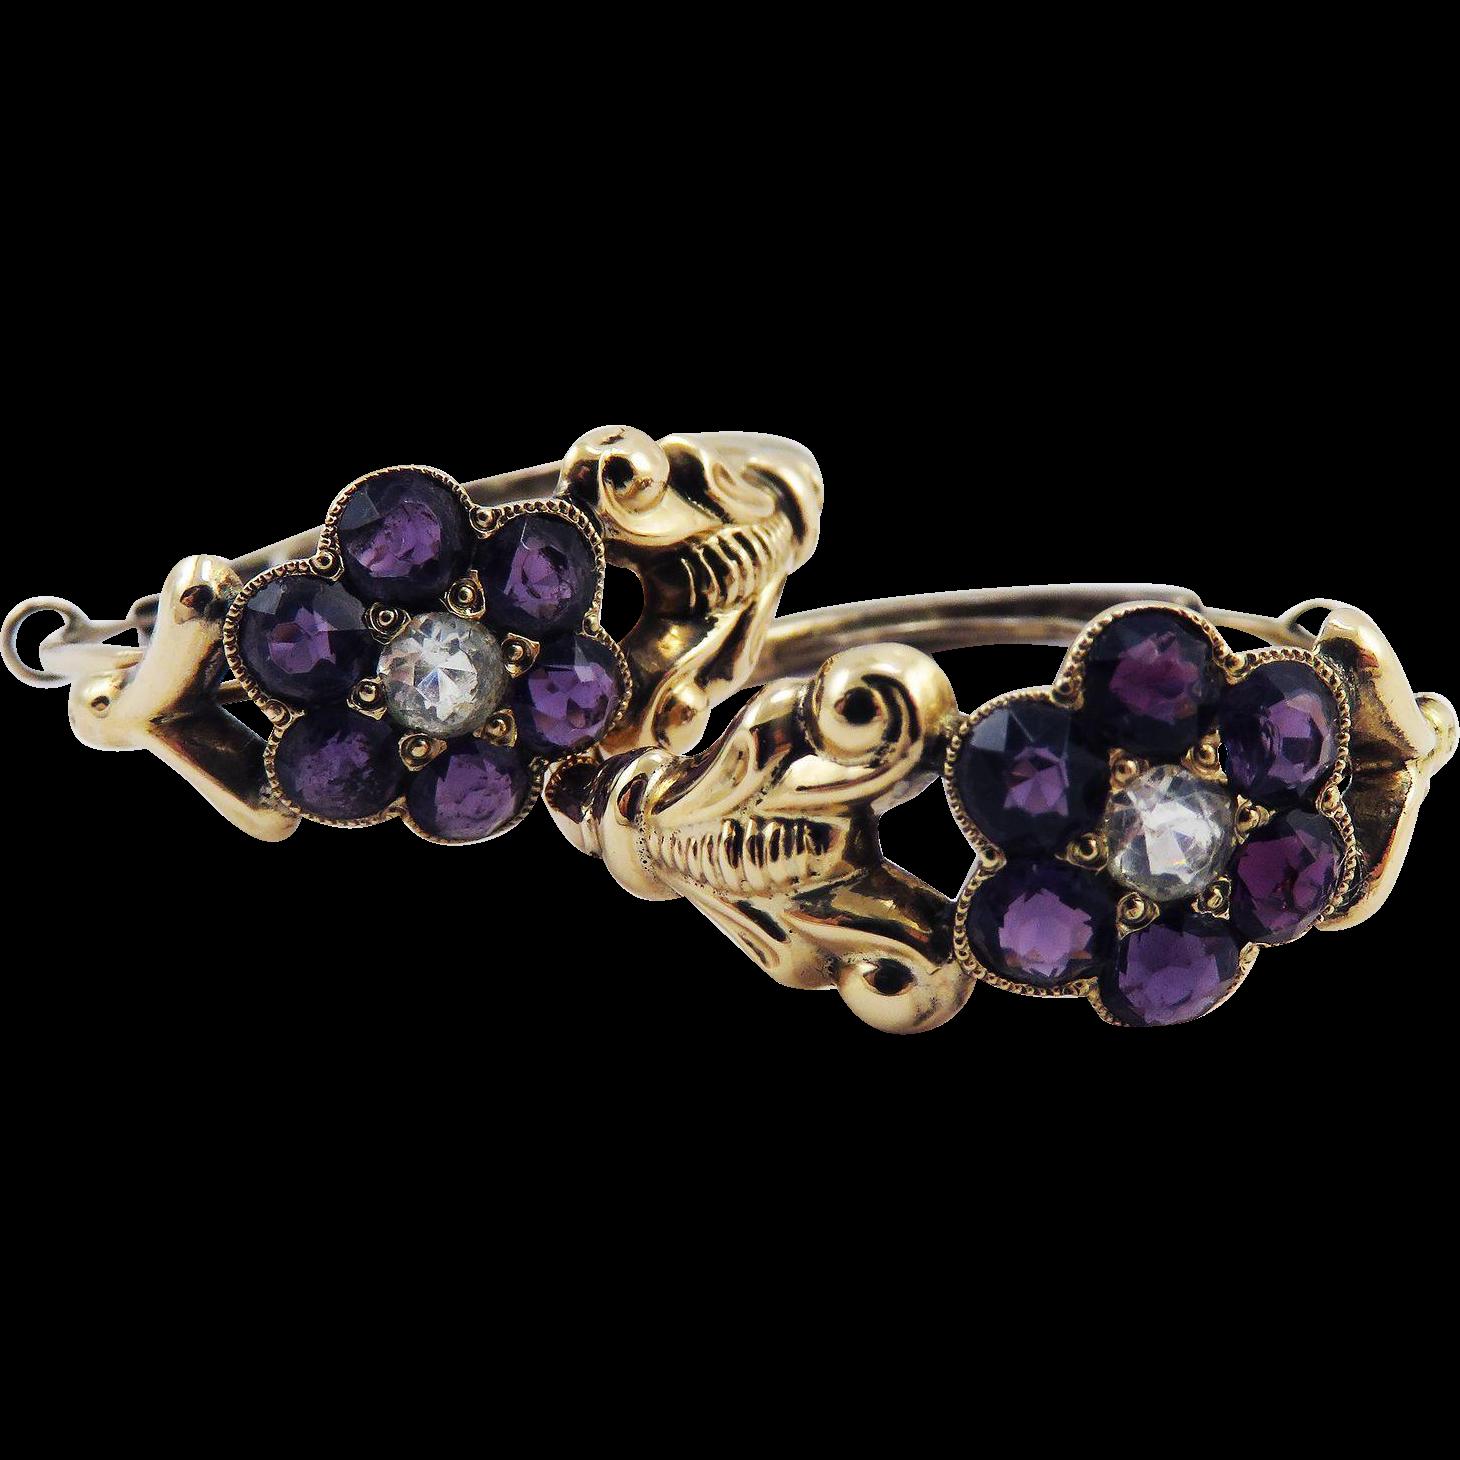 SWEET VIOLETS: Near-Pristine Late Georgian 14k Rose Gold Creole Hoop Earrings w/Paste Violets, c.1825!